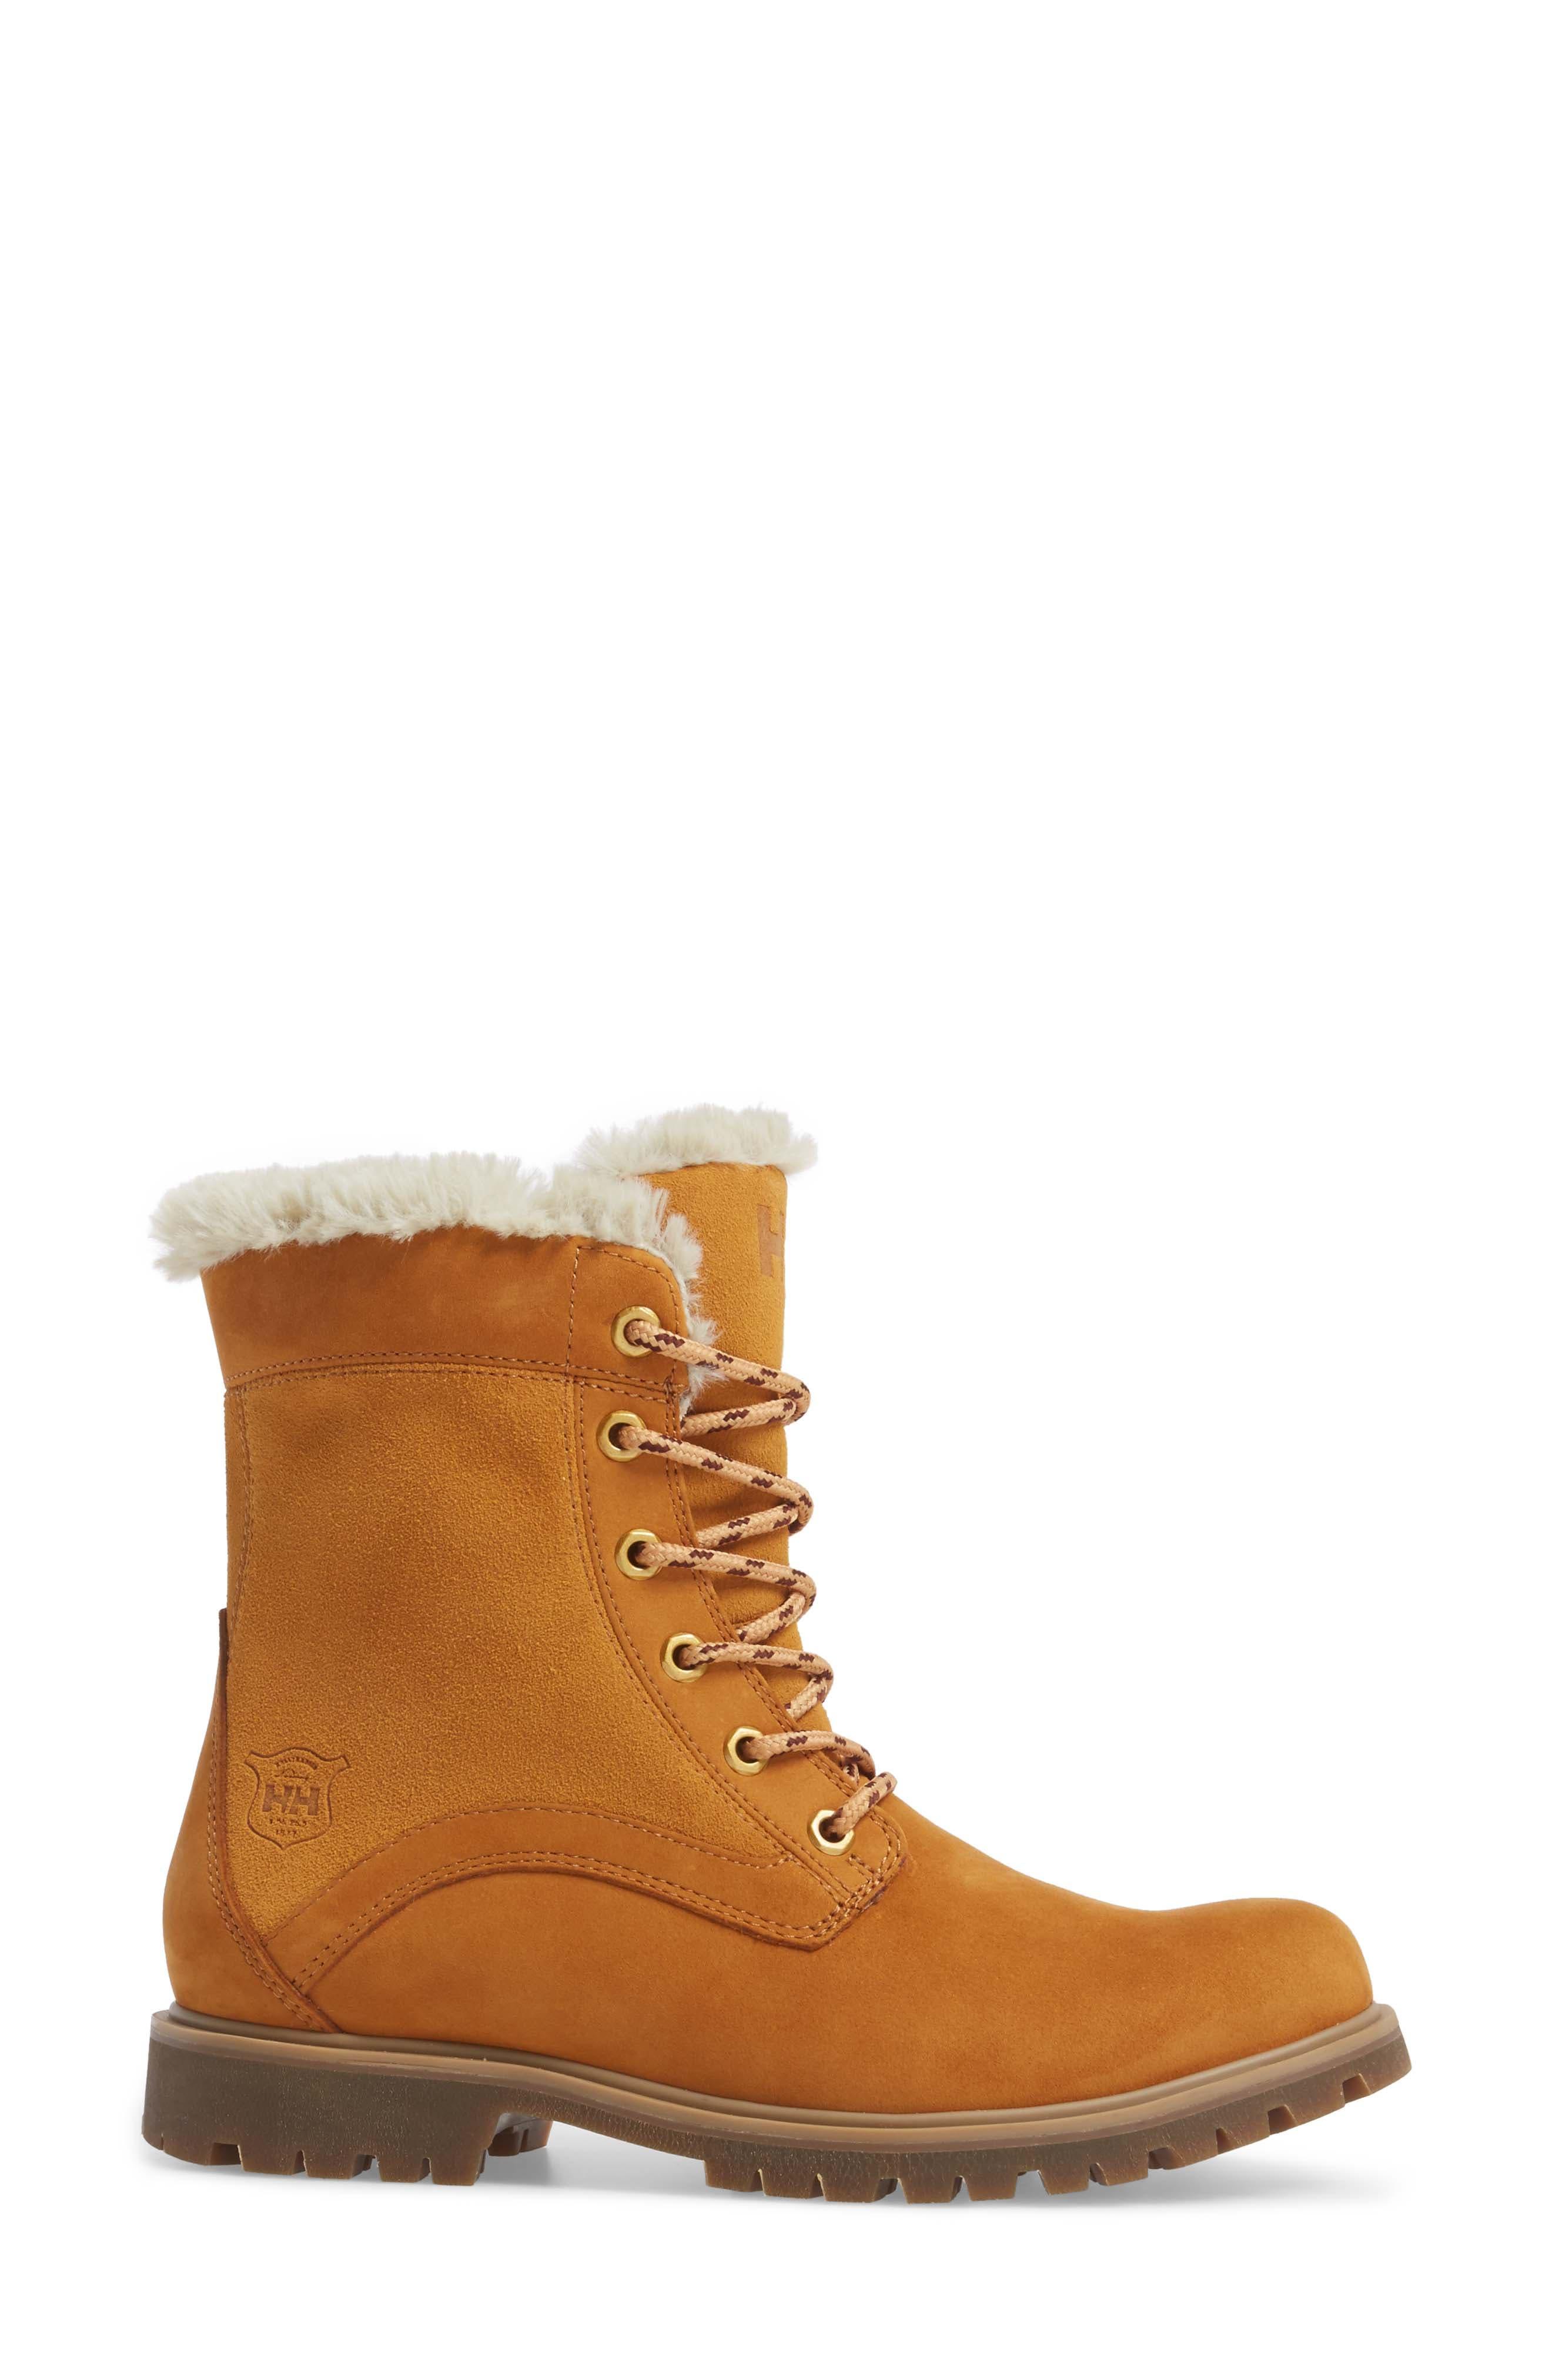 Alternate Image 3  - Helly Hansen Marion Waterproof Winter Boot (Women)